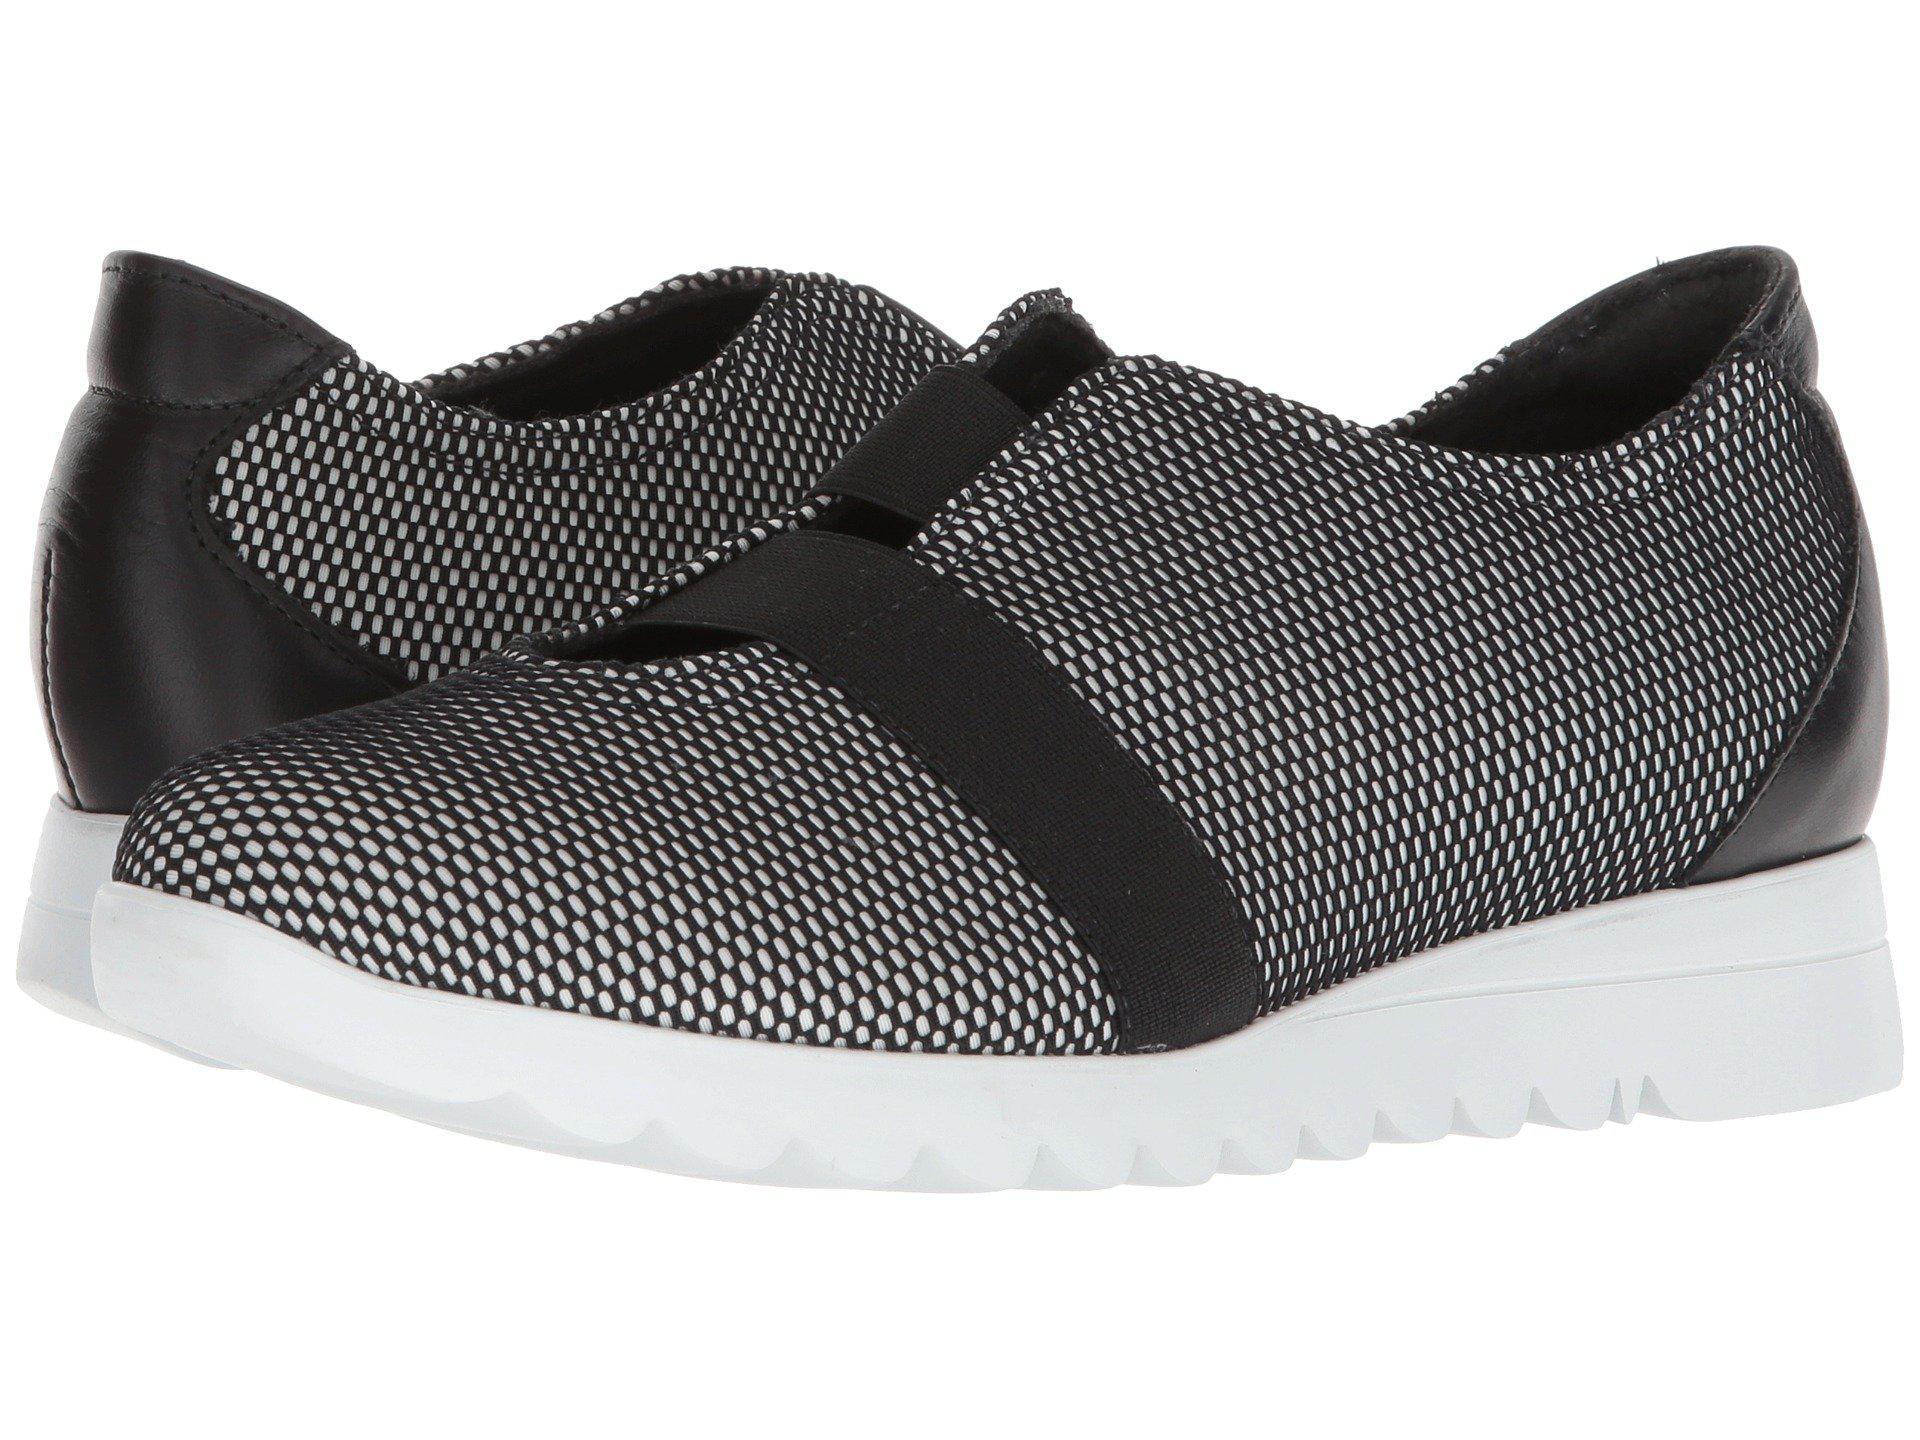 6998e57e31f Lyst - Munro Alta (black white Mesh) Women s Slip On Shoes in Black